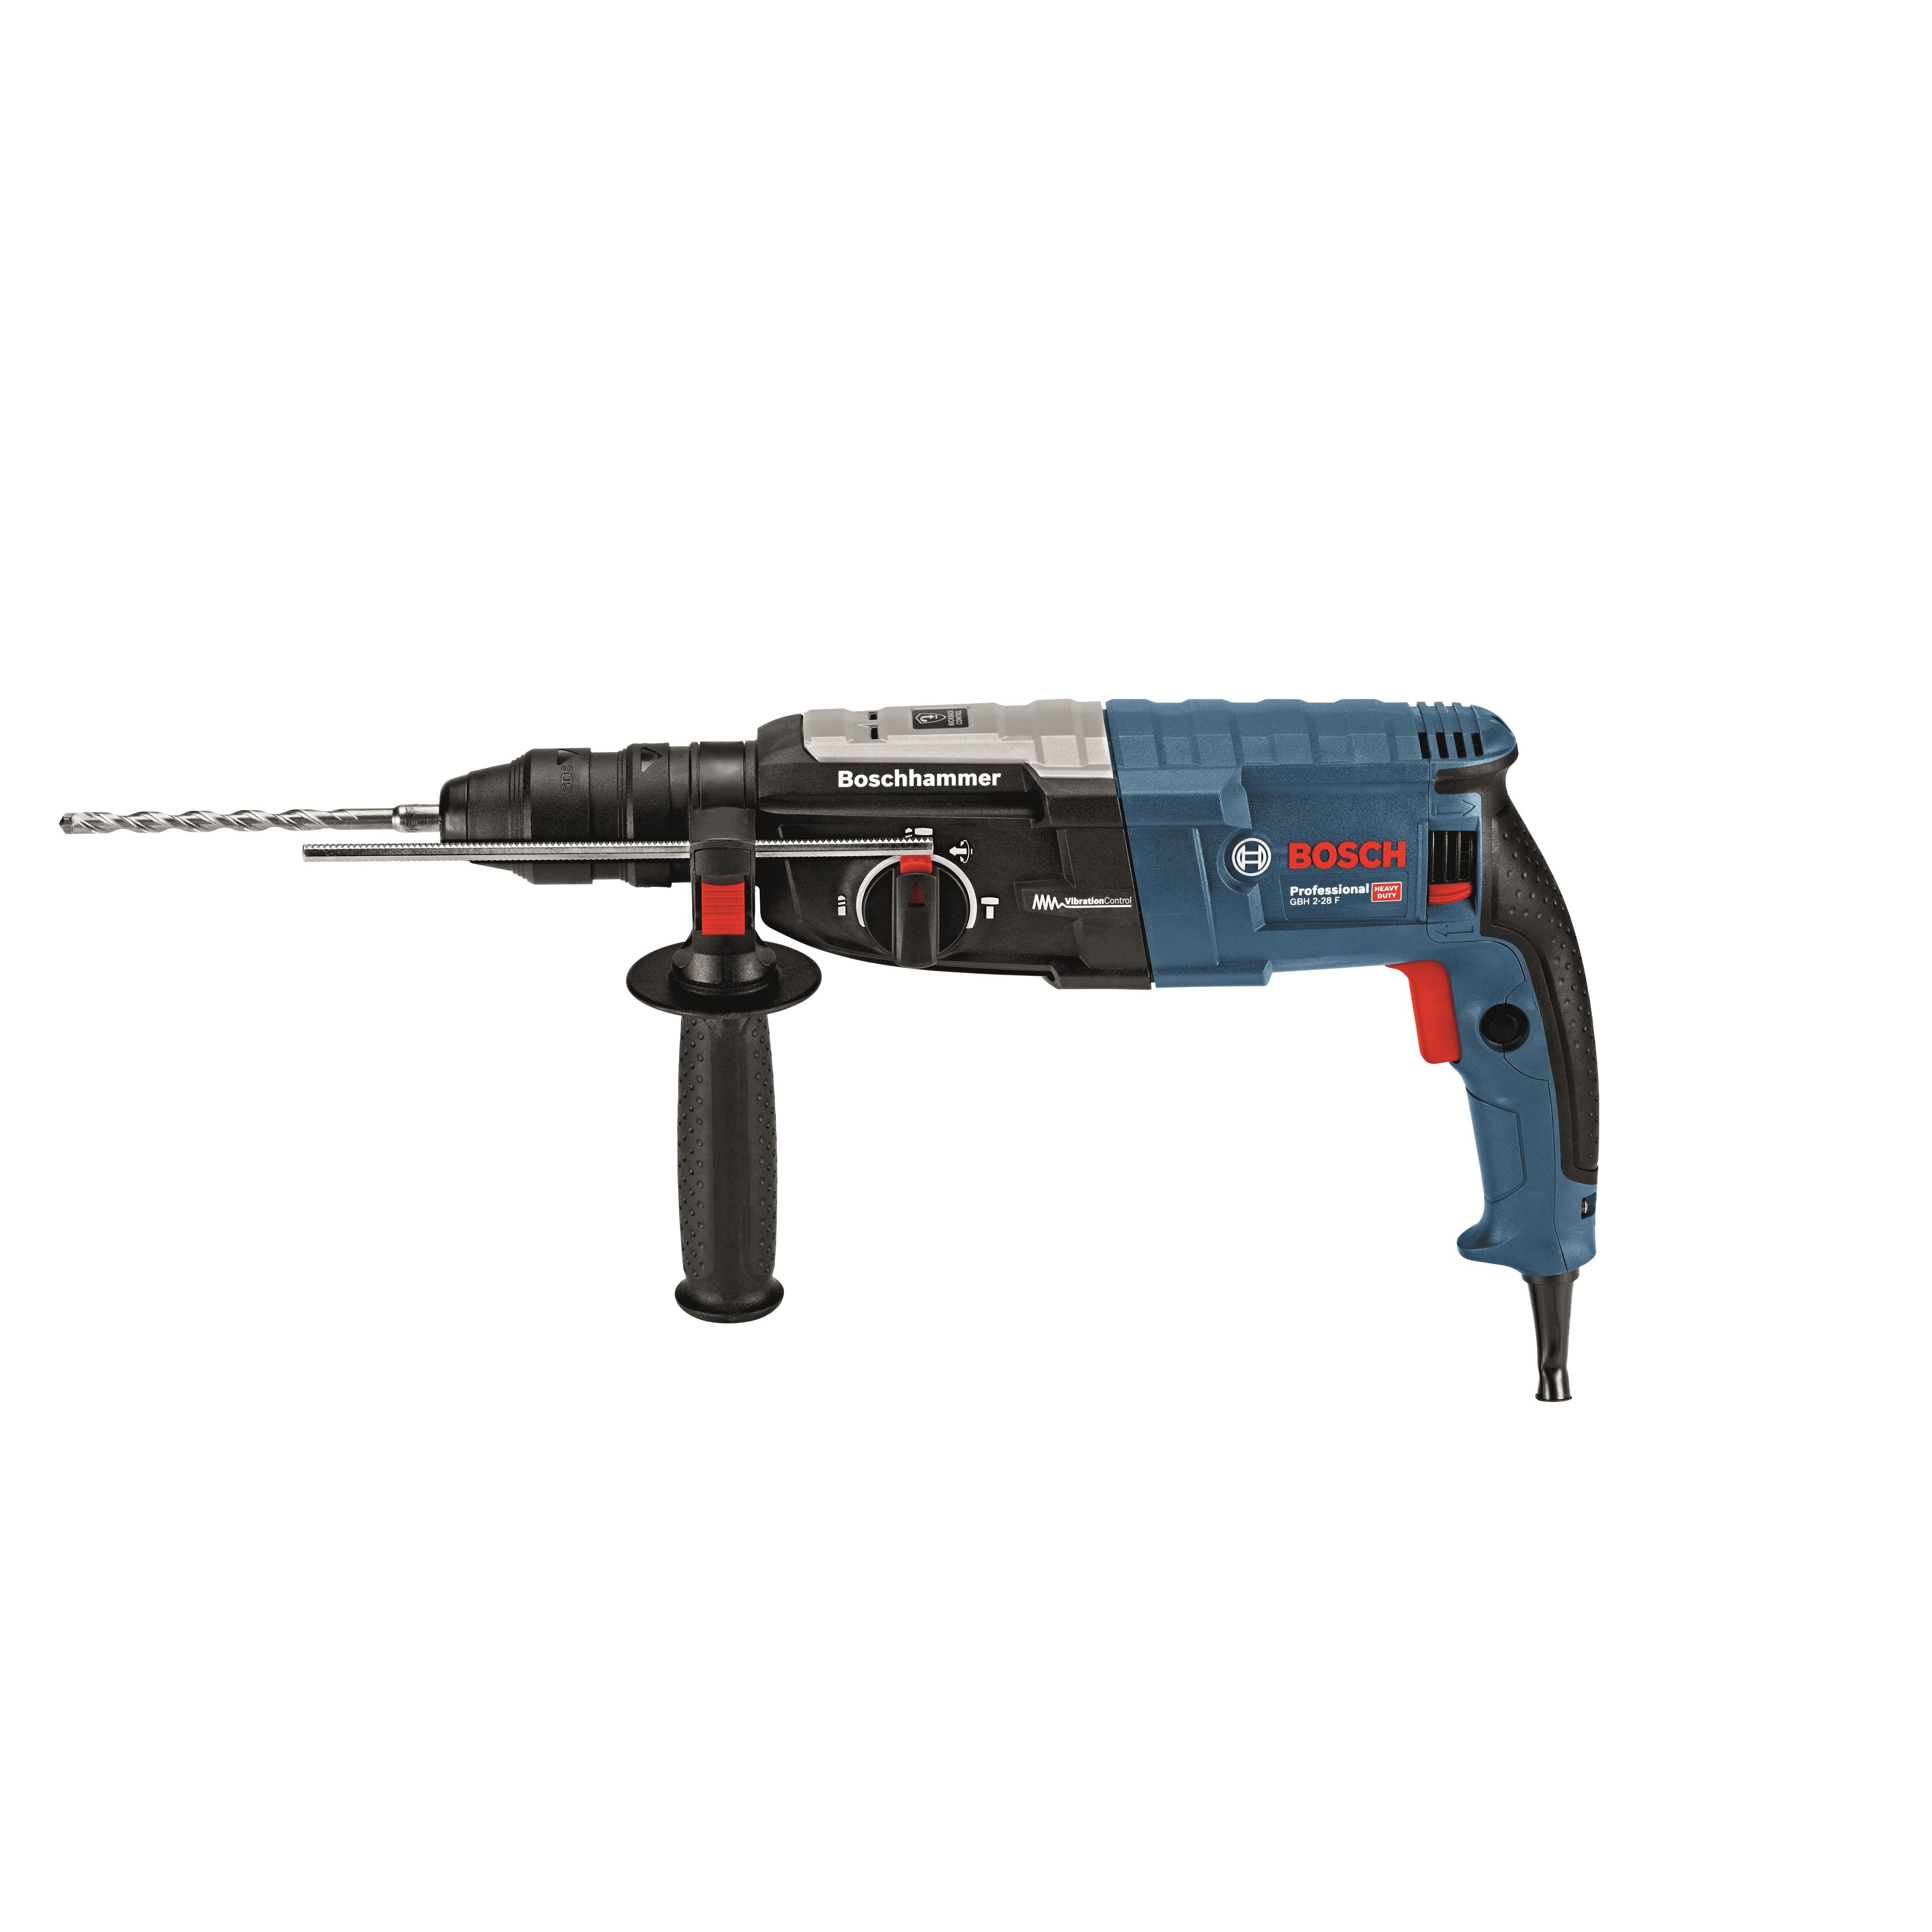 Ciocan rotopercutor Bosch GBH 2-28 F, SDS+, 880 W, KickBack Control